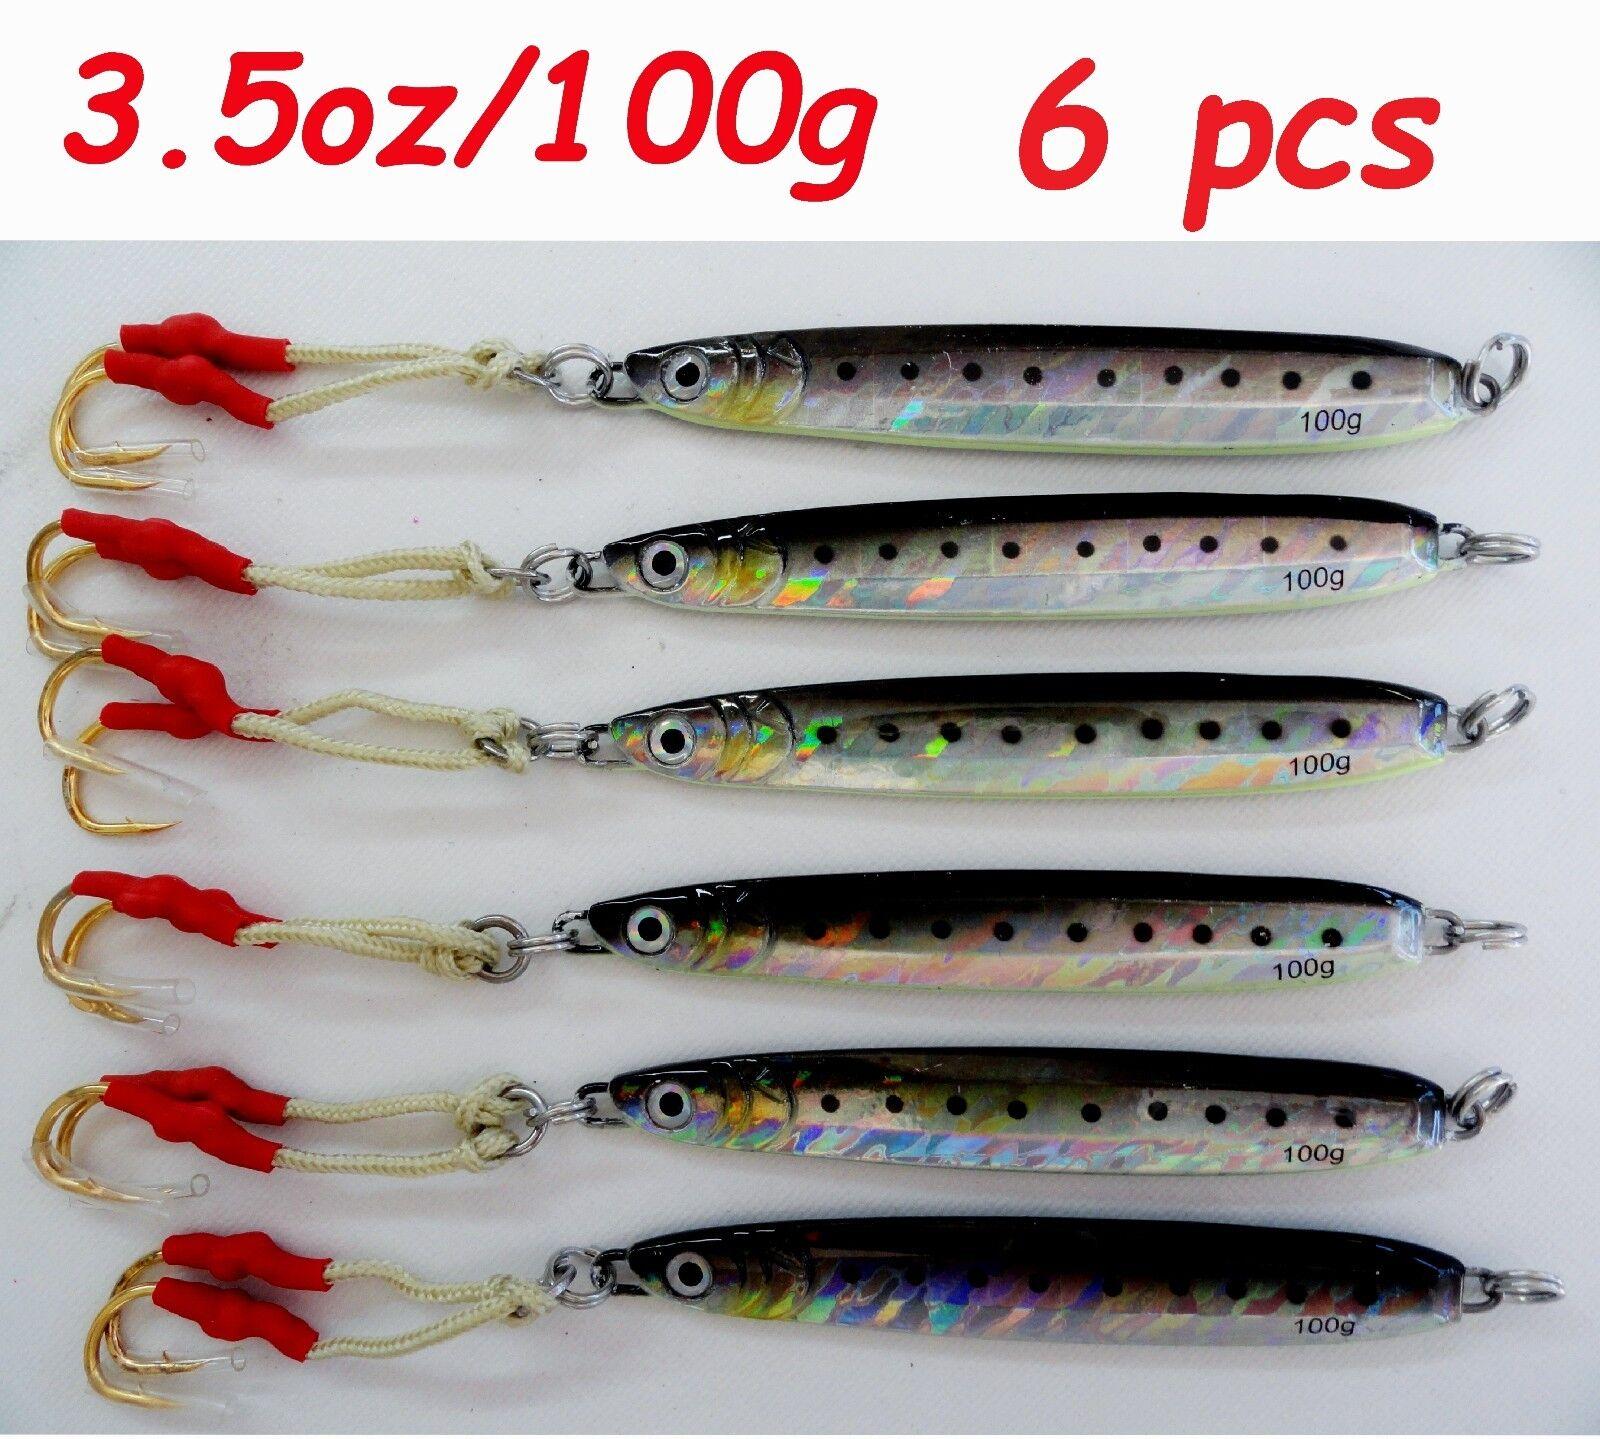 Knife jig 3.5oz 100g Sardine 6 Pieces Grünical Butterfly Saltwater fishing lures